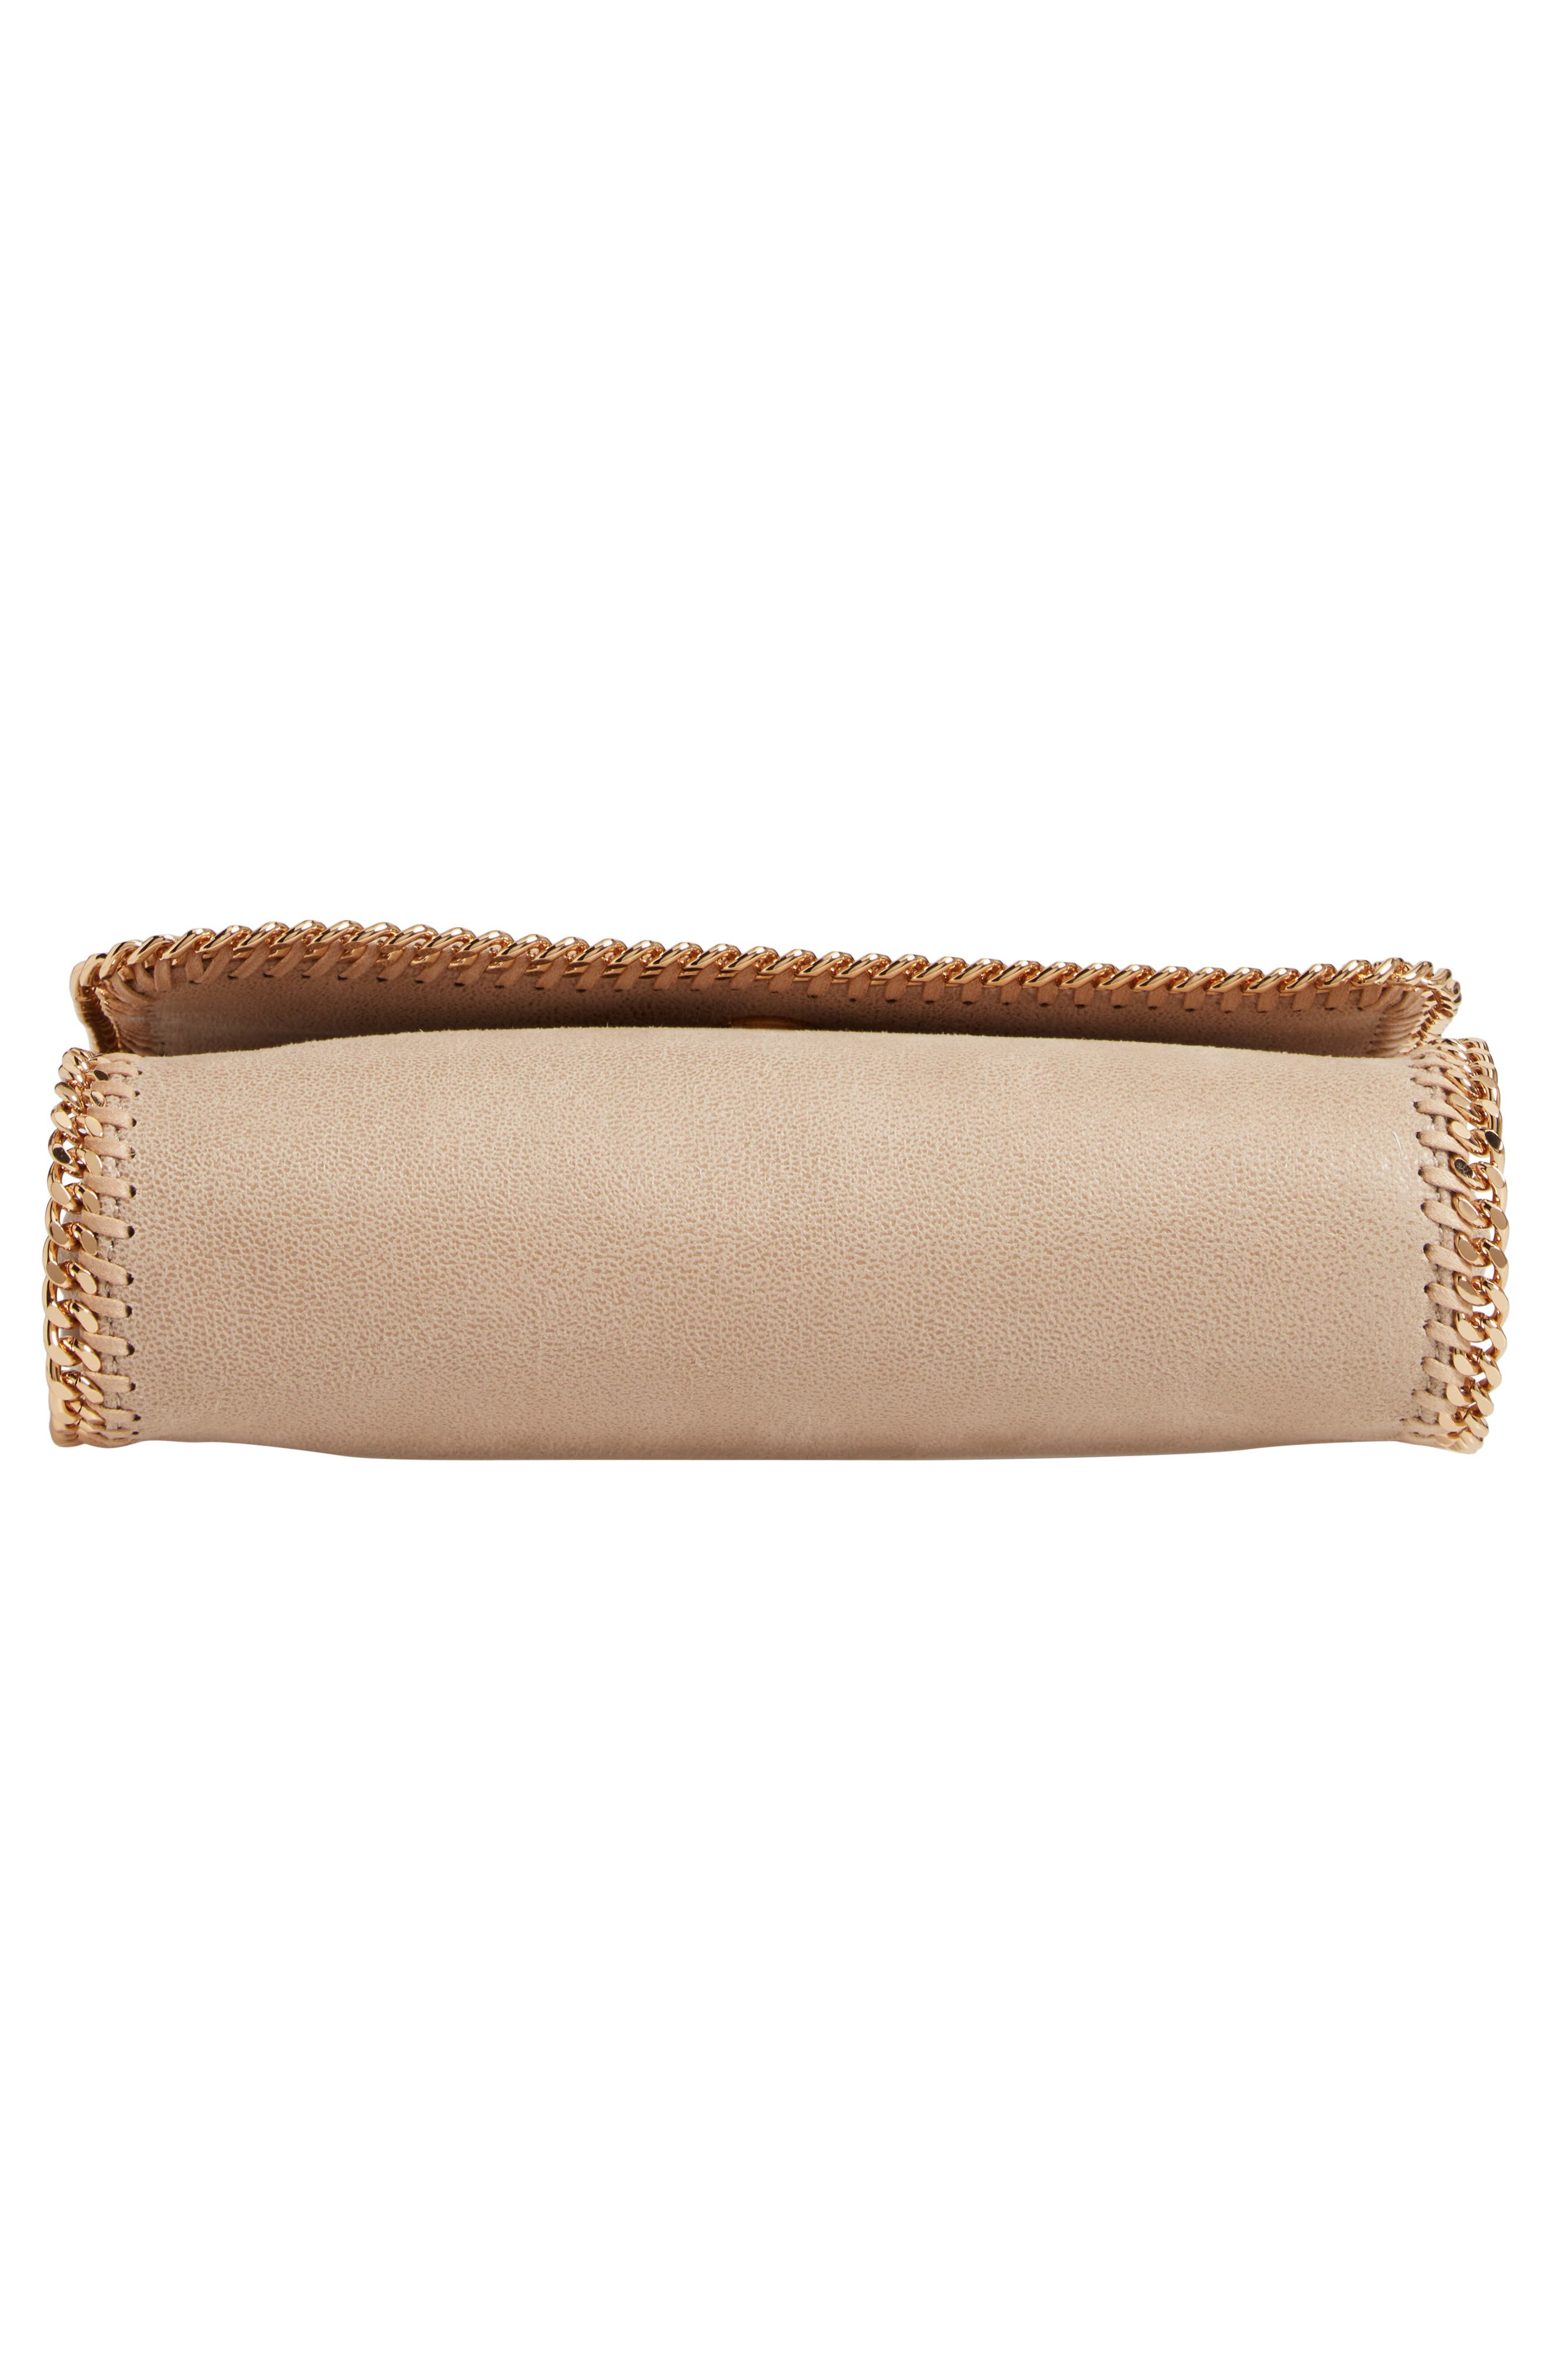 STELLA MCCARTNEY, Falabella Shaggy Deer Faux Leather Shoulder Bag, Alternate thumbnail 7, color, CLOTTED CREAM